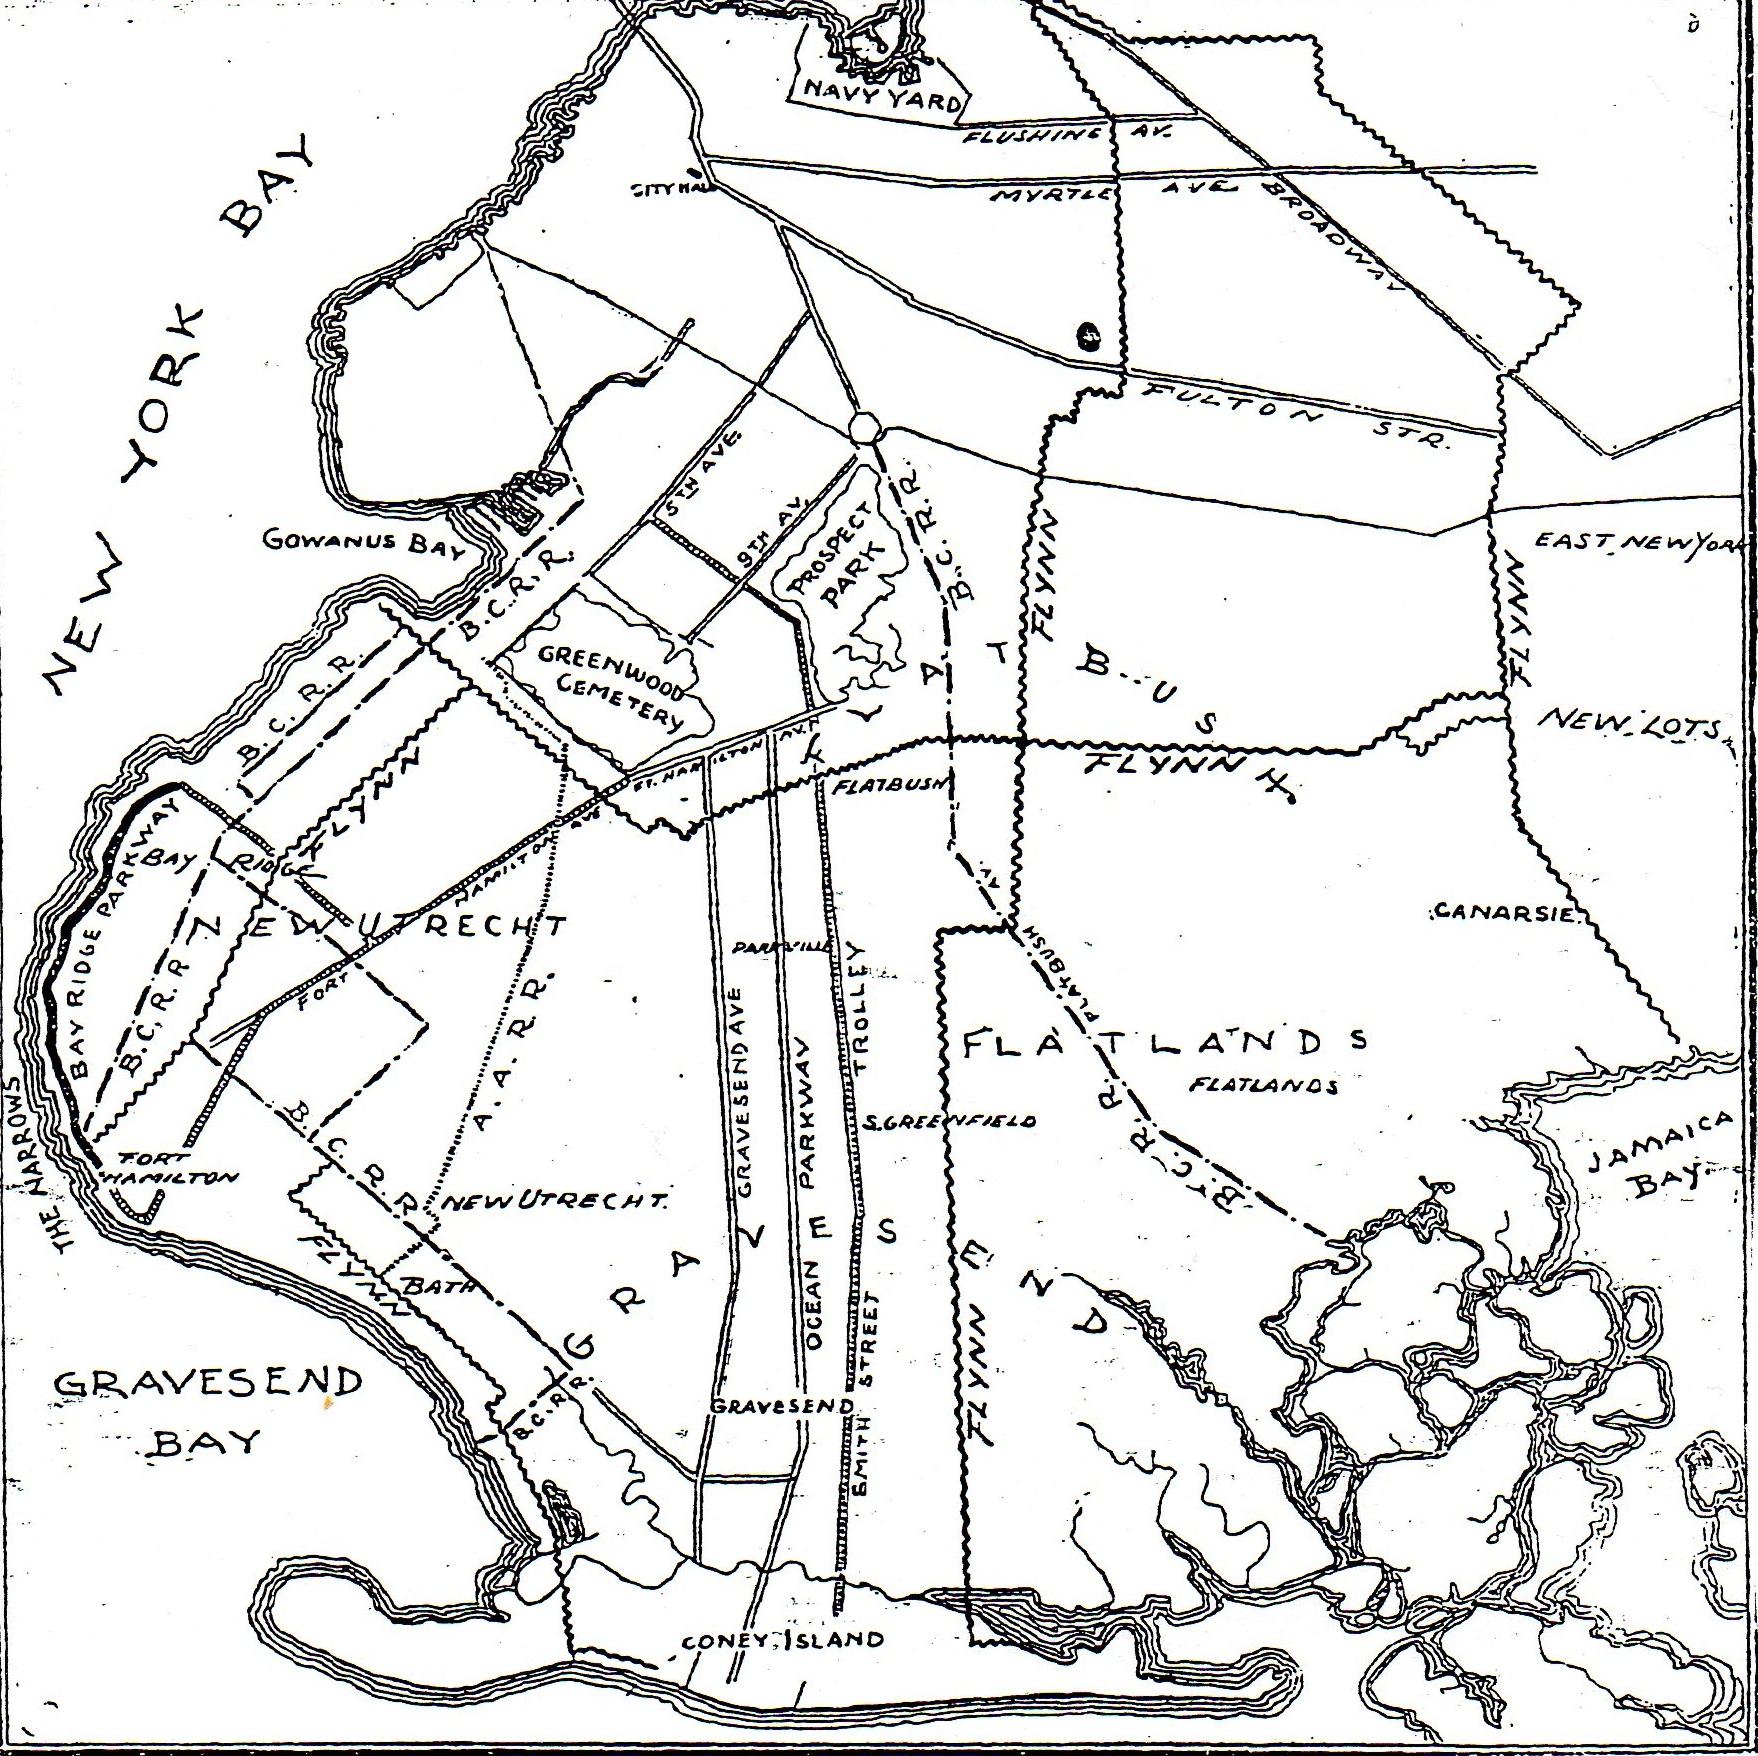 1758x1756 Brooklyn In The 19th Century Ephemeral New York